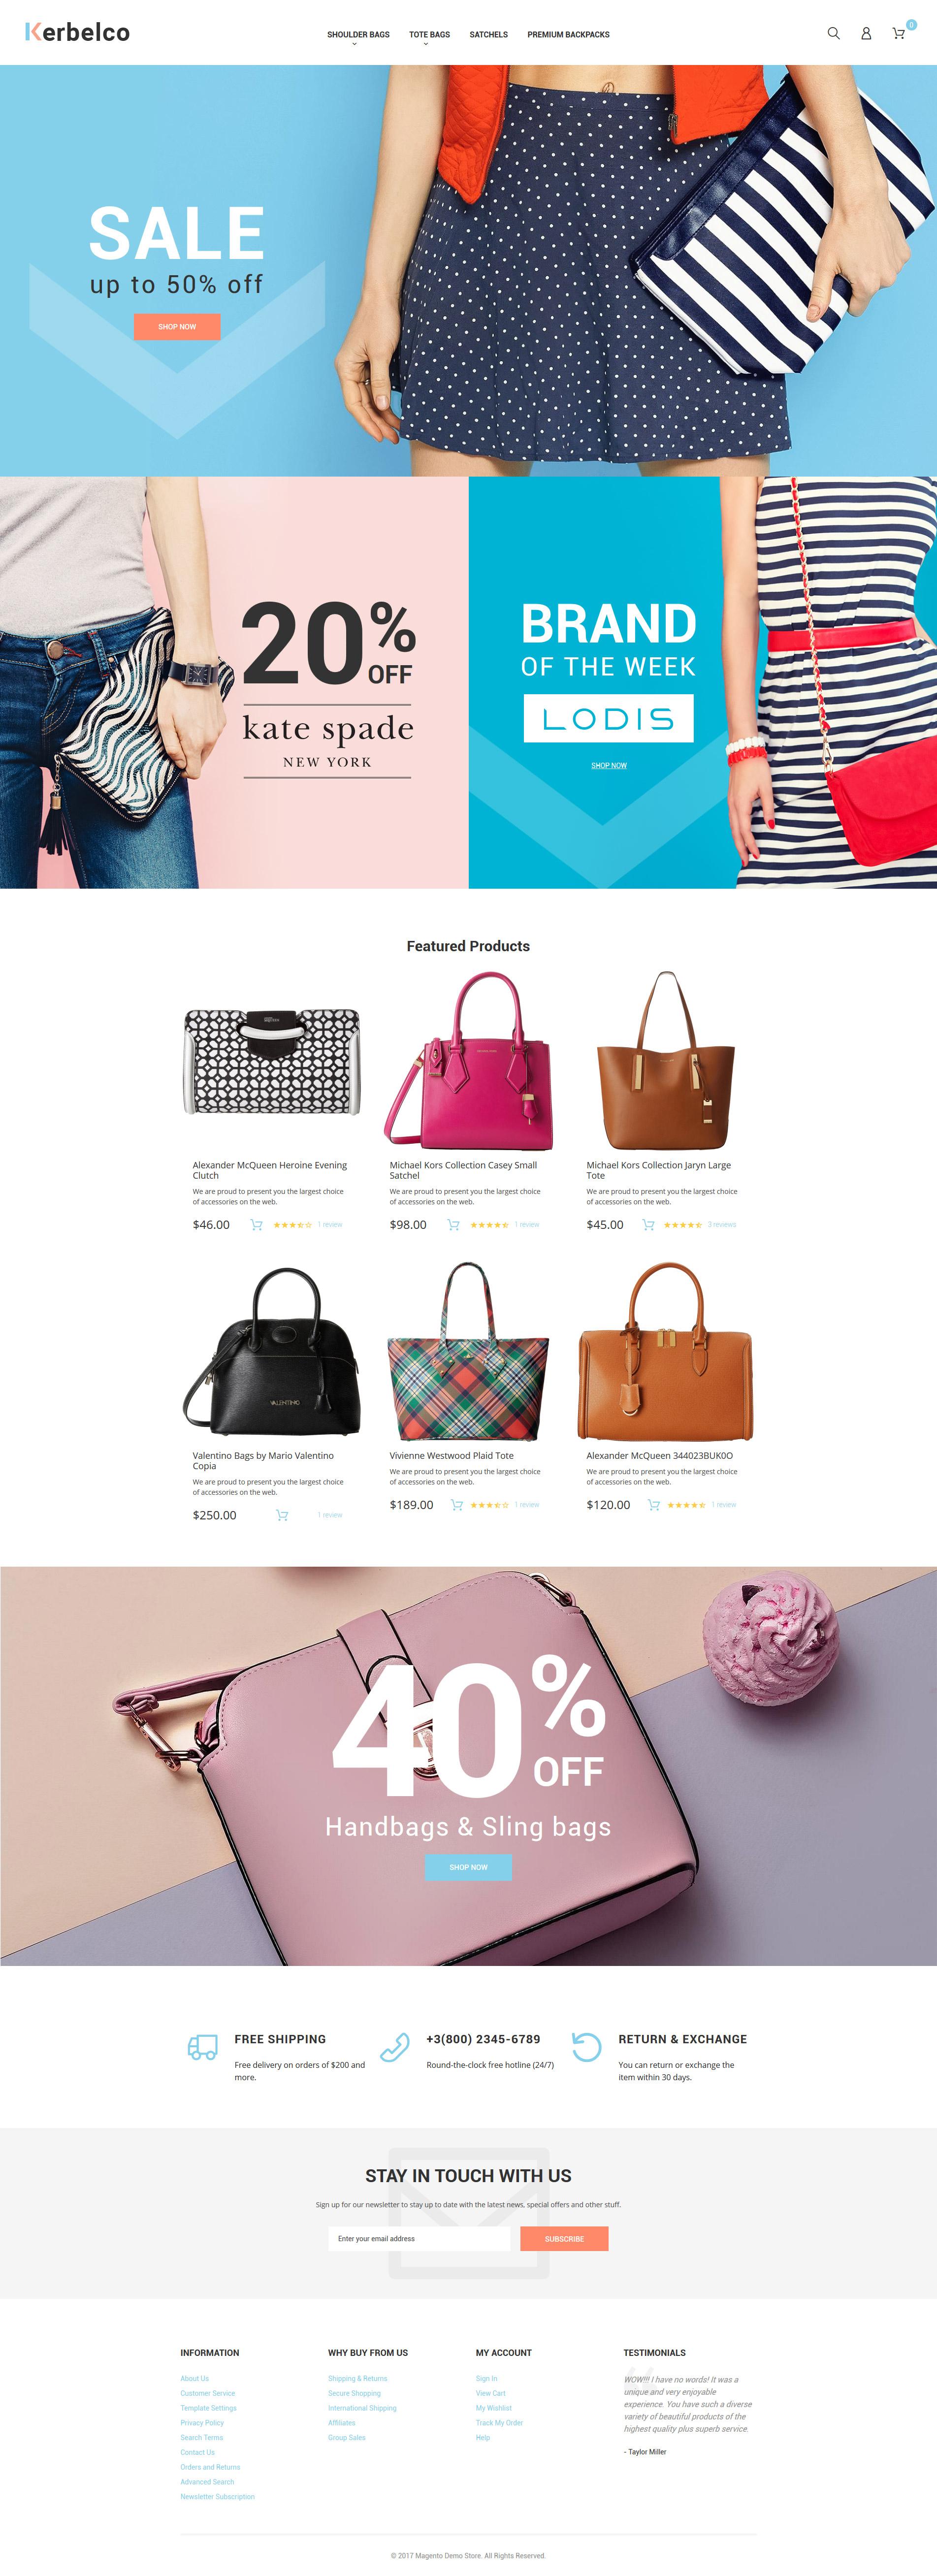 Responsive Fashion & Handbags Magento 2 Theme #62099 - Ekran resmi